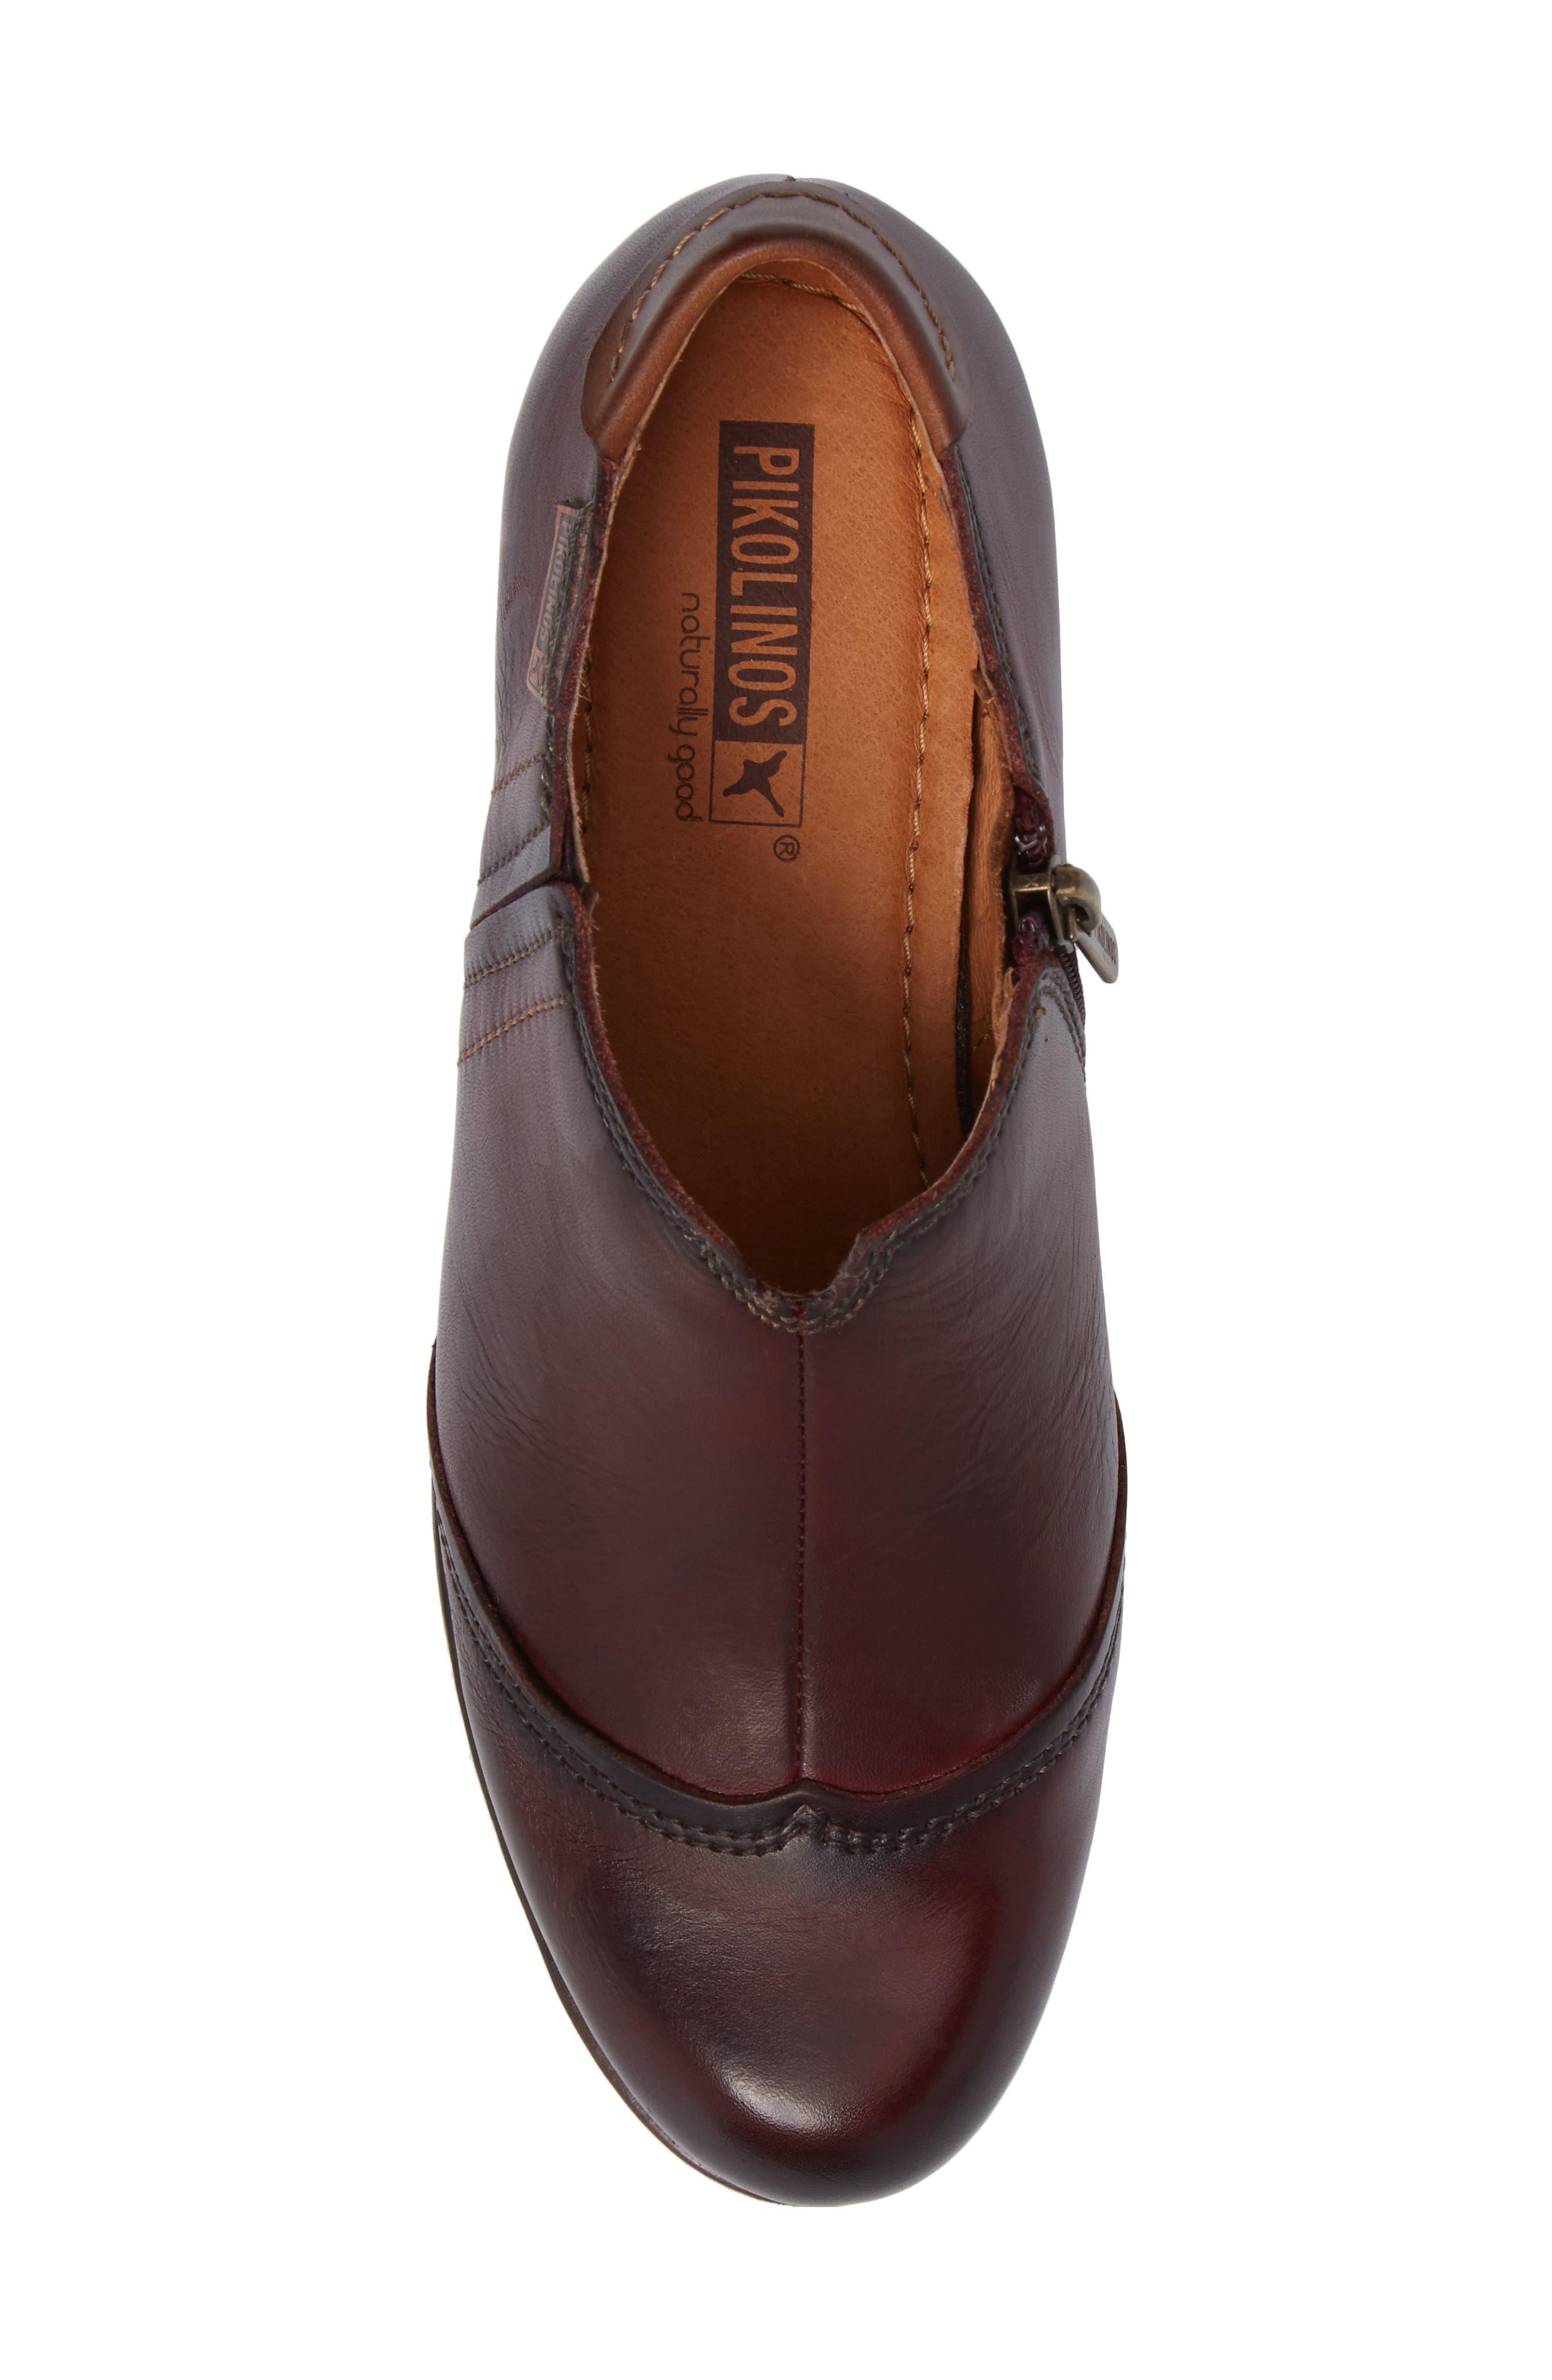 Rotterdam Bootie,                             Alternate thumbnail 5, color,                             Garnet Cuero Leather